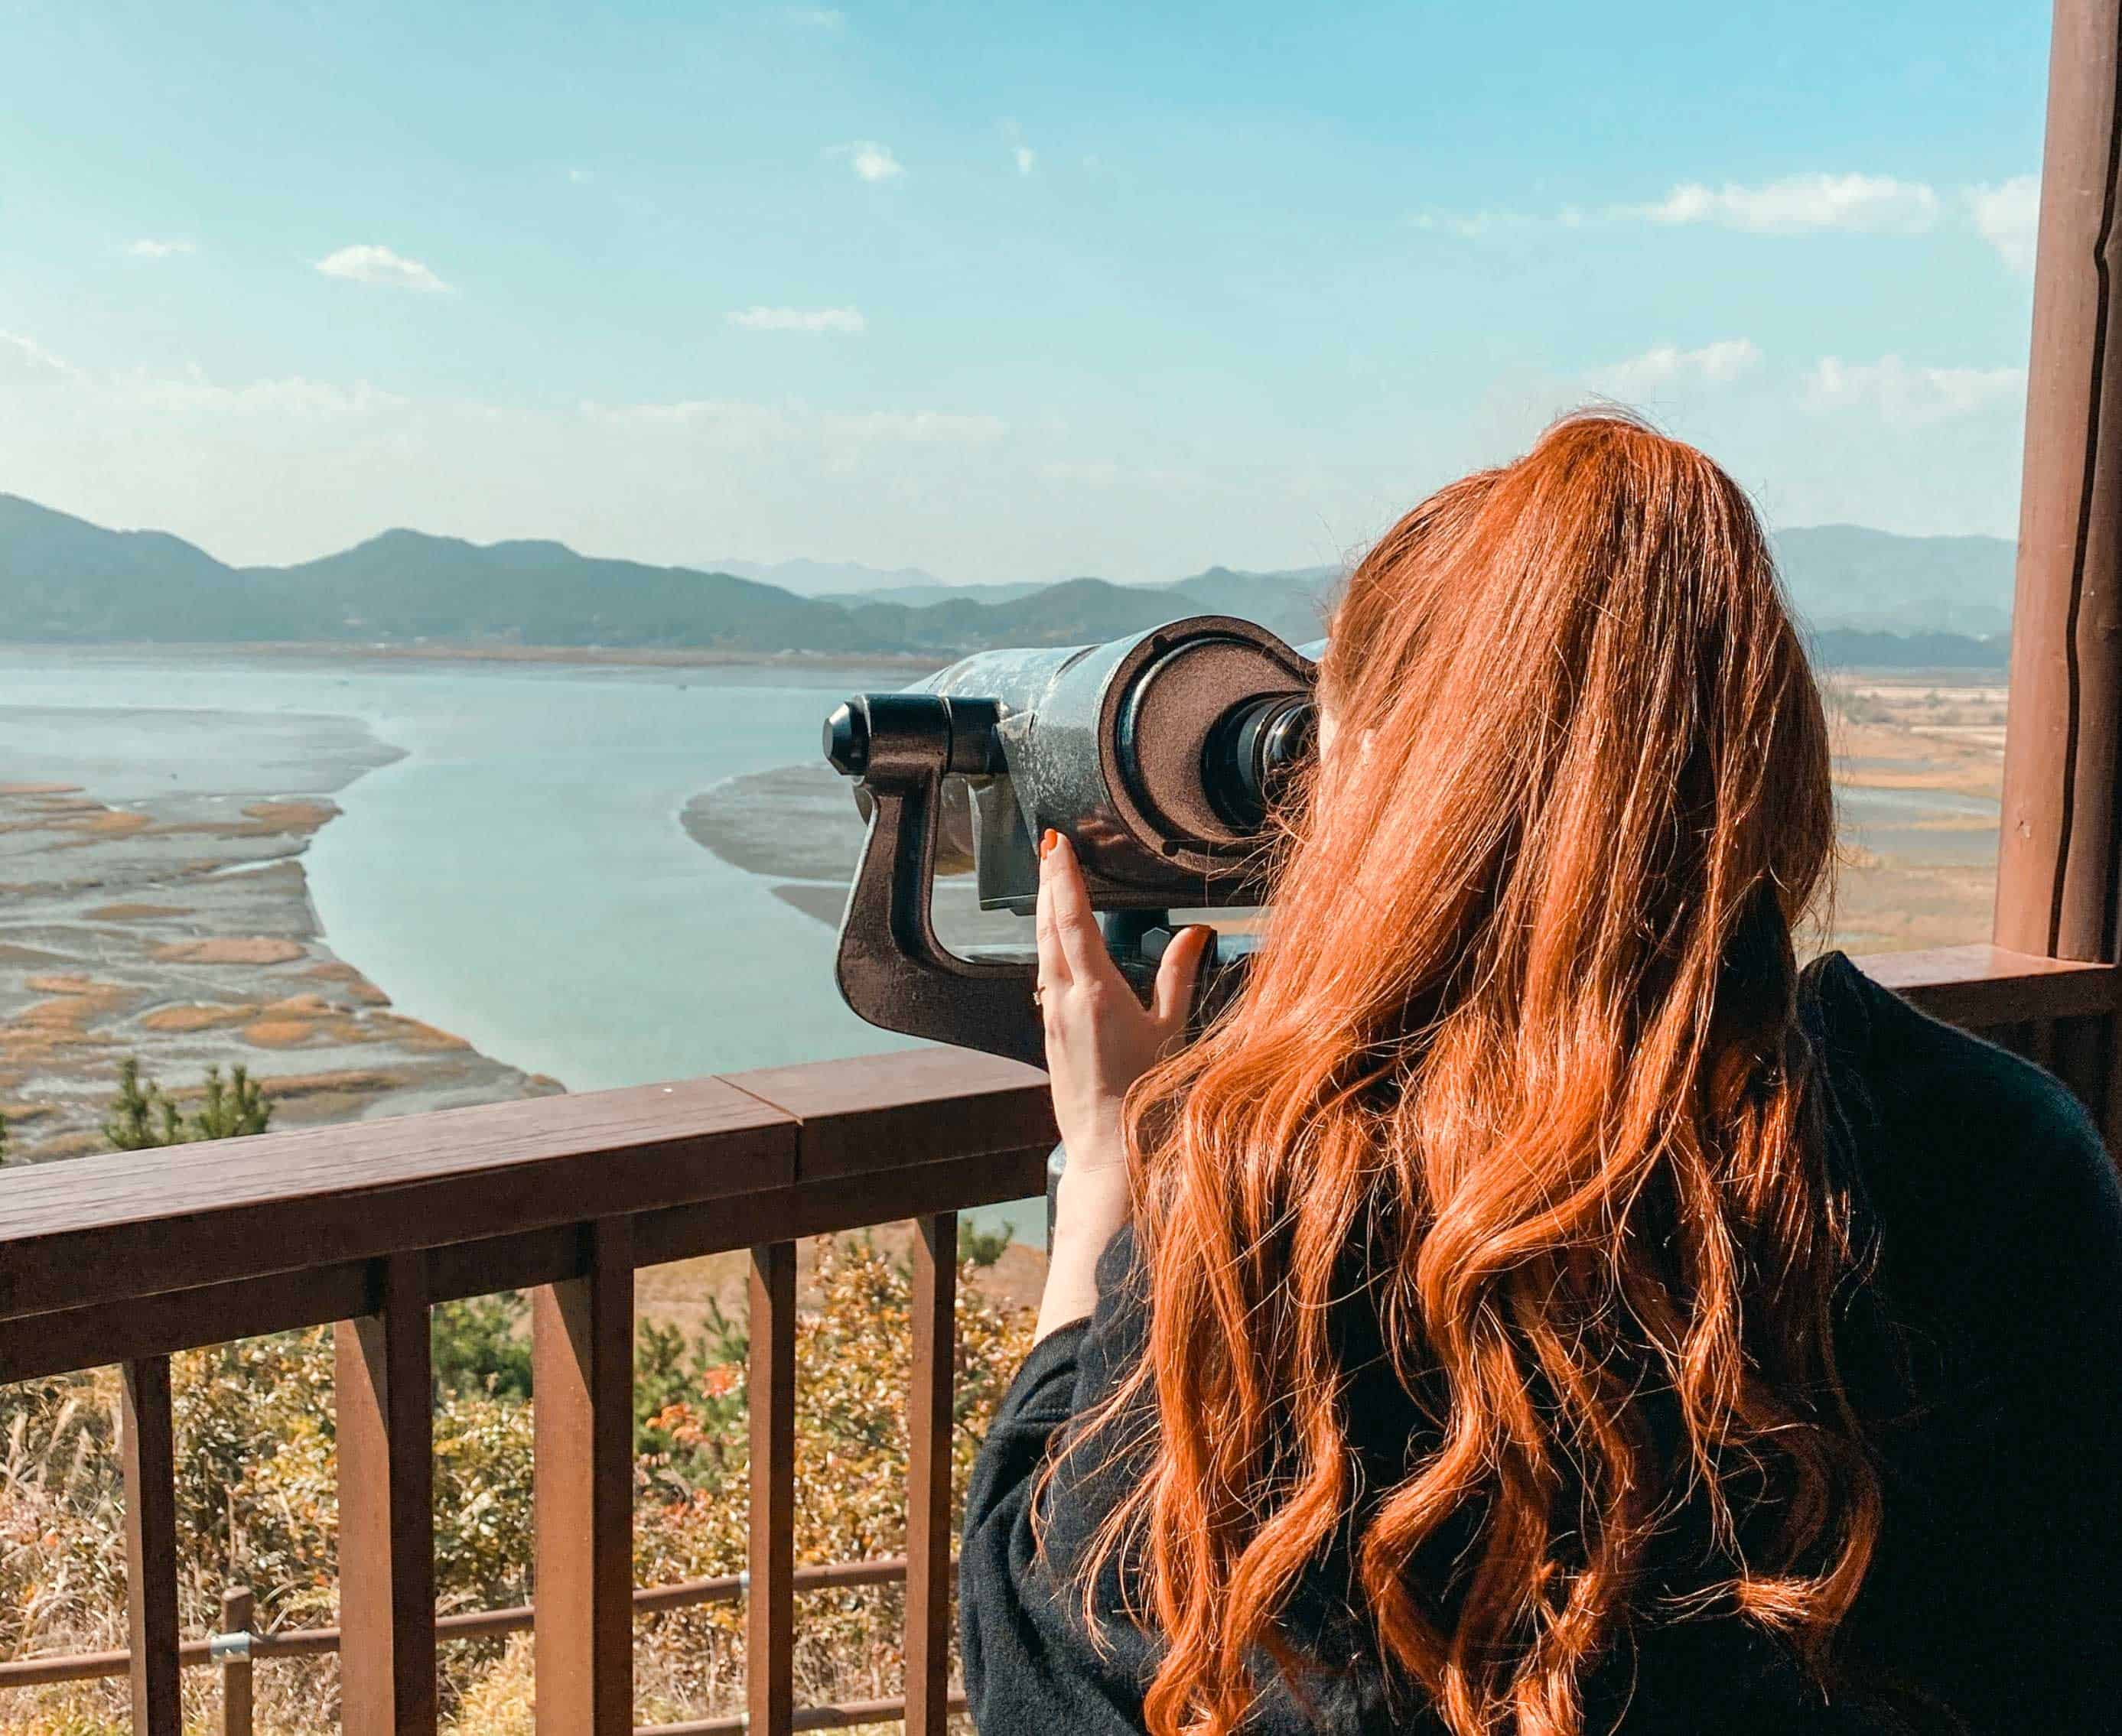 Suncheon Bay Top Things To Do